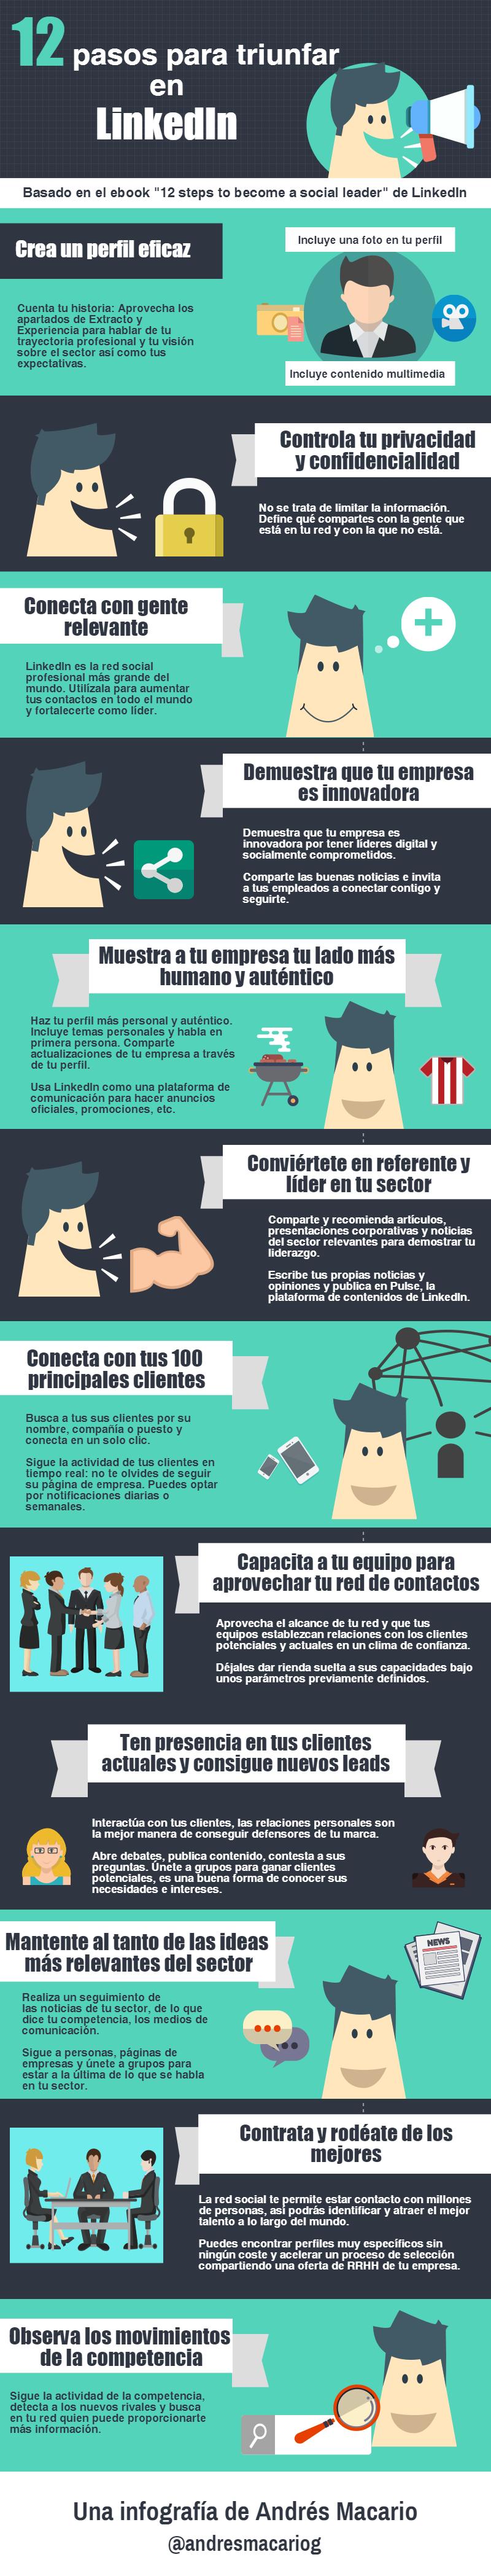 12 pasos para triunfar en LinkedIn #infografia #infographic #socialmedia